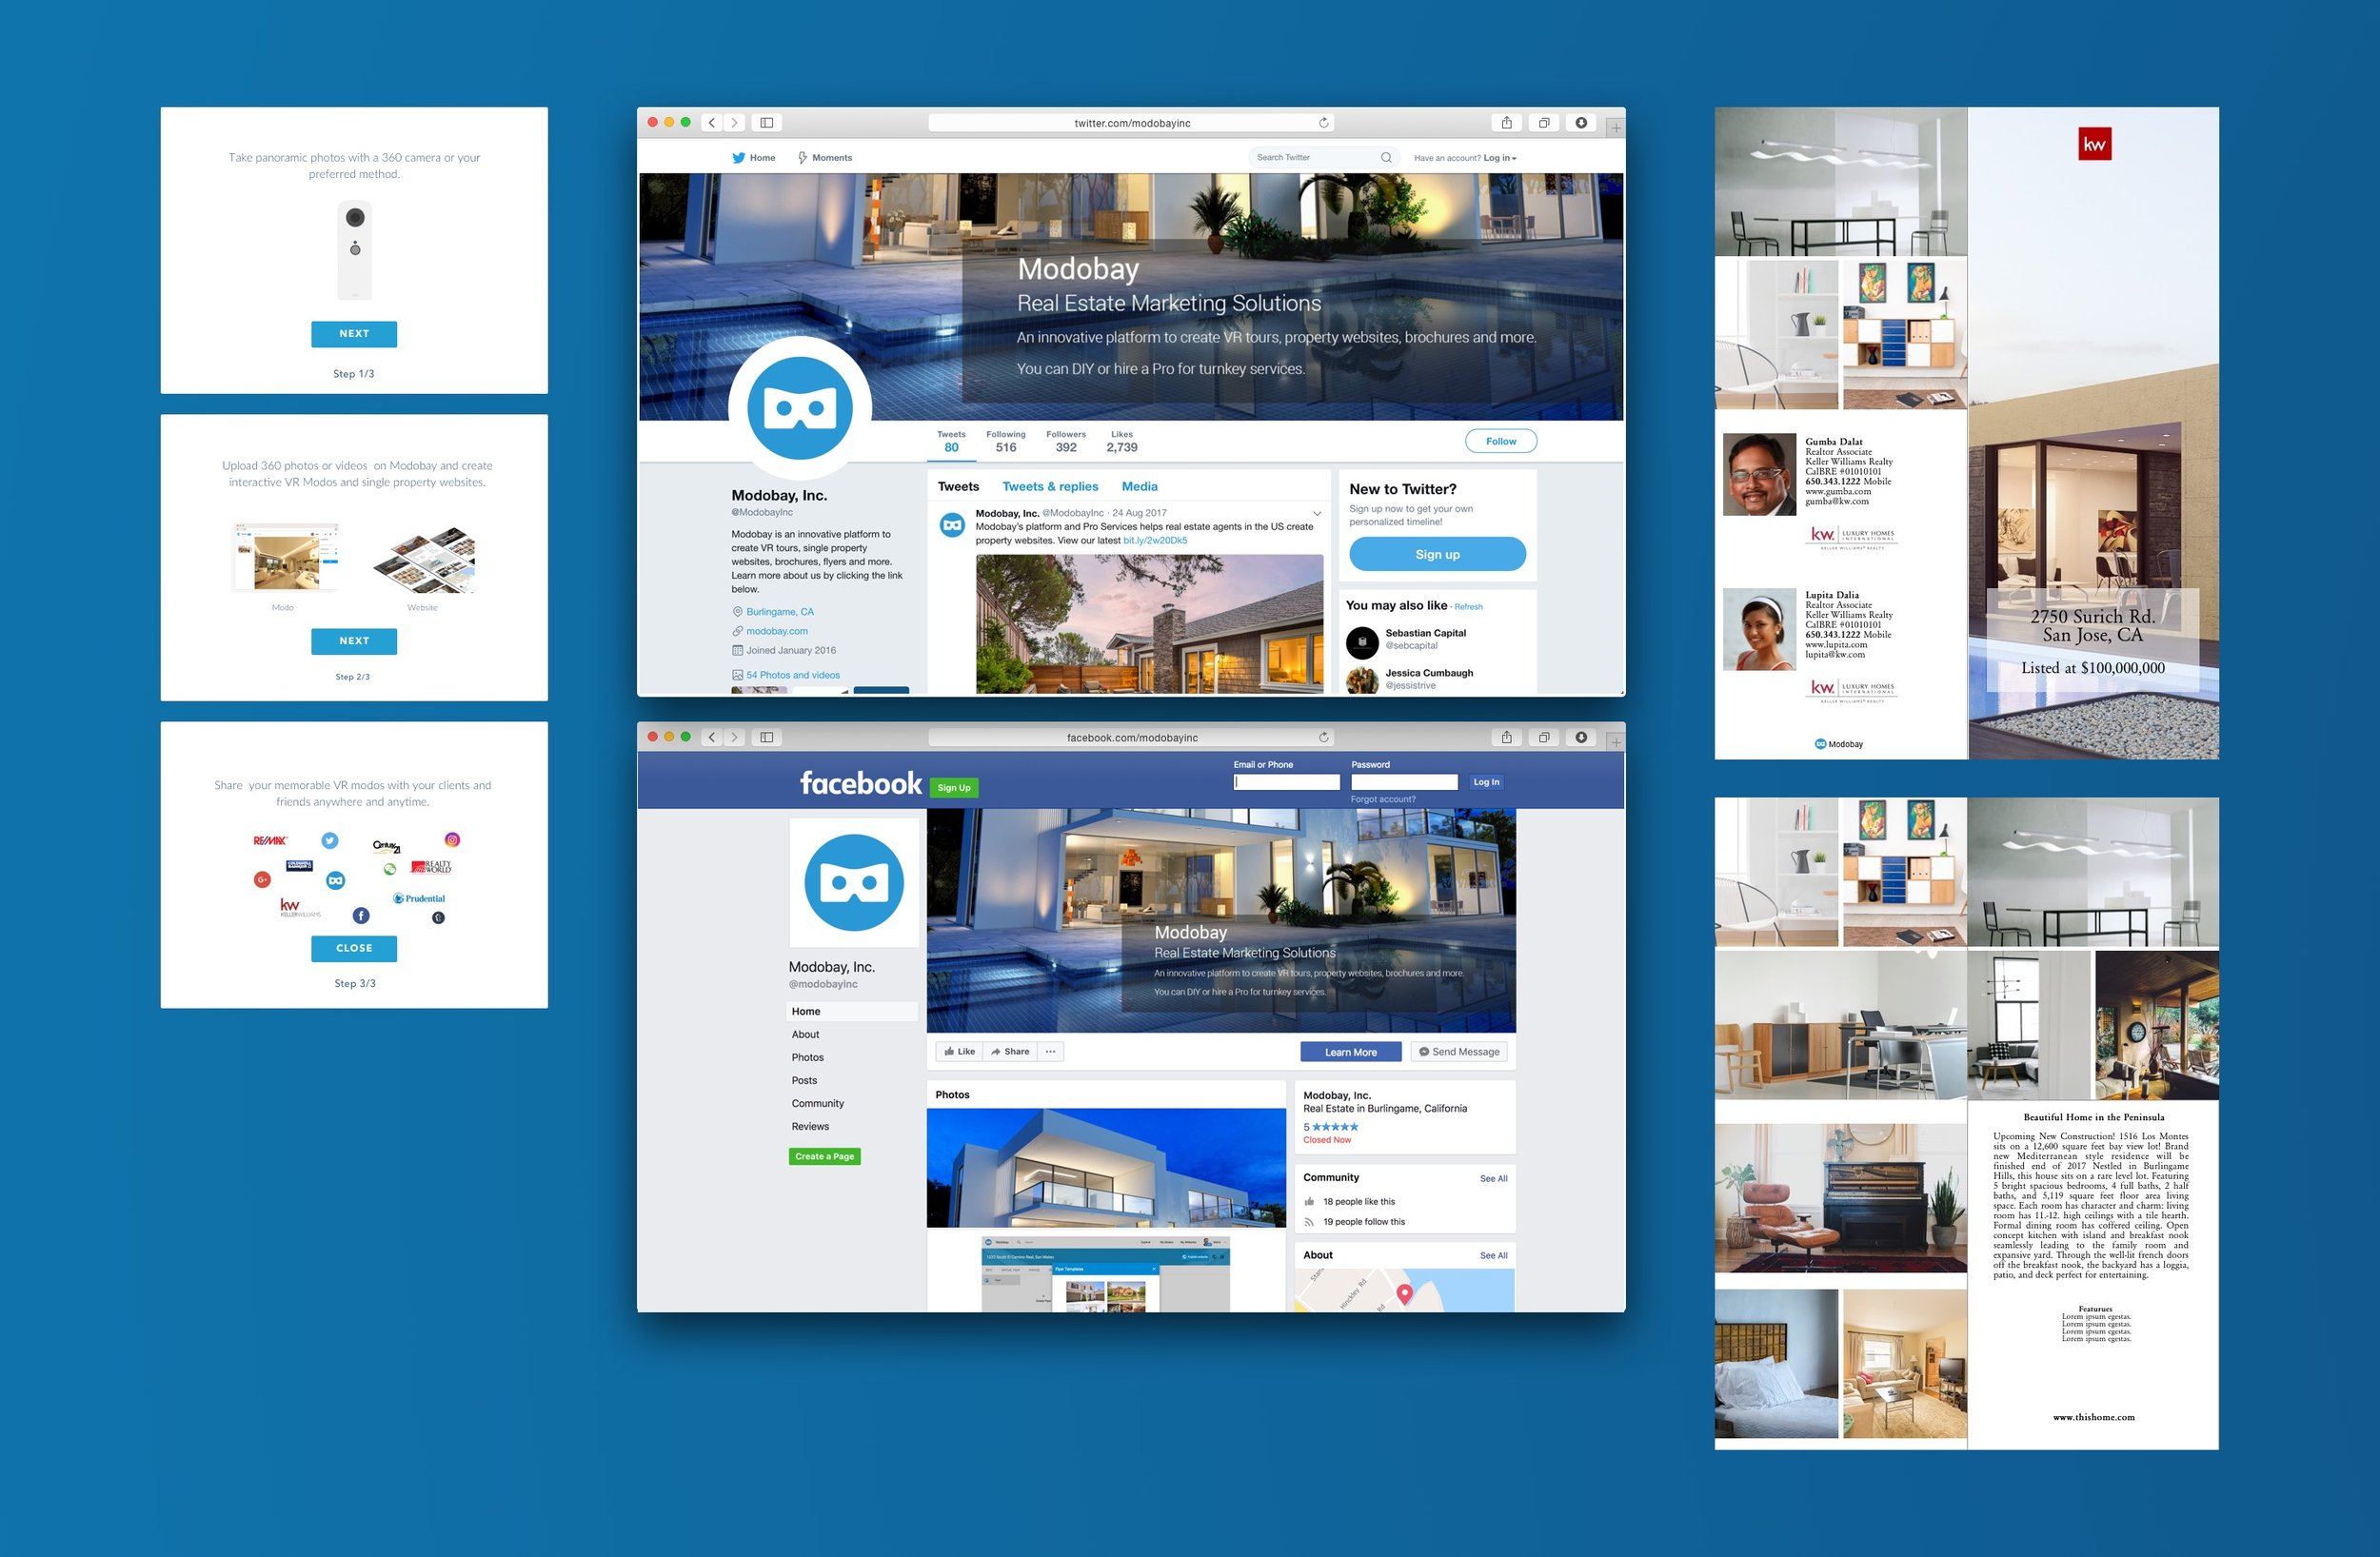 modobay-assets.jpg